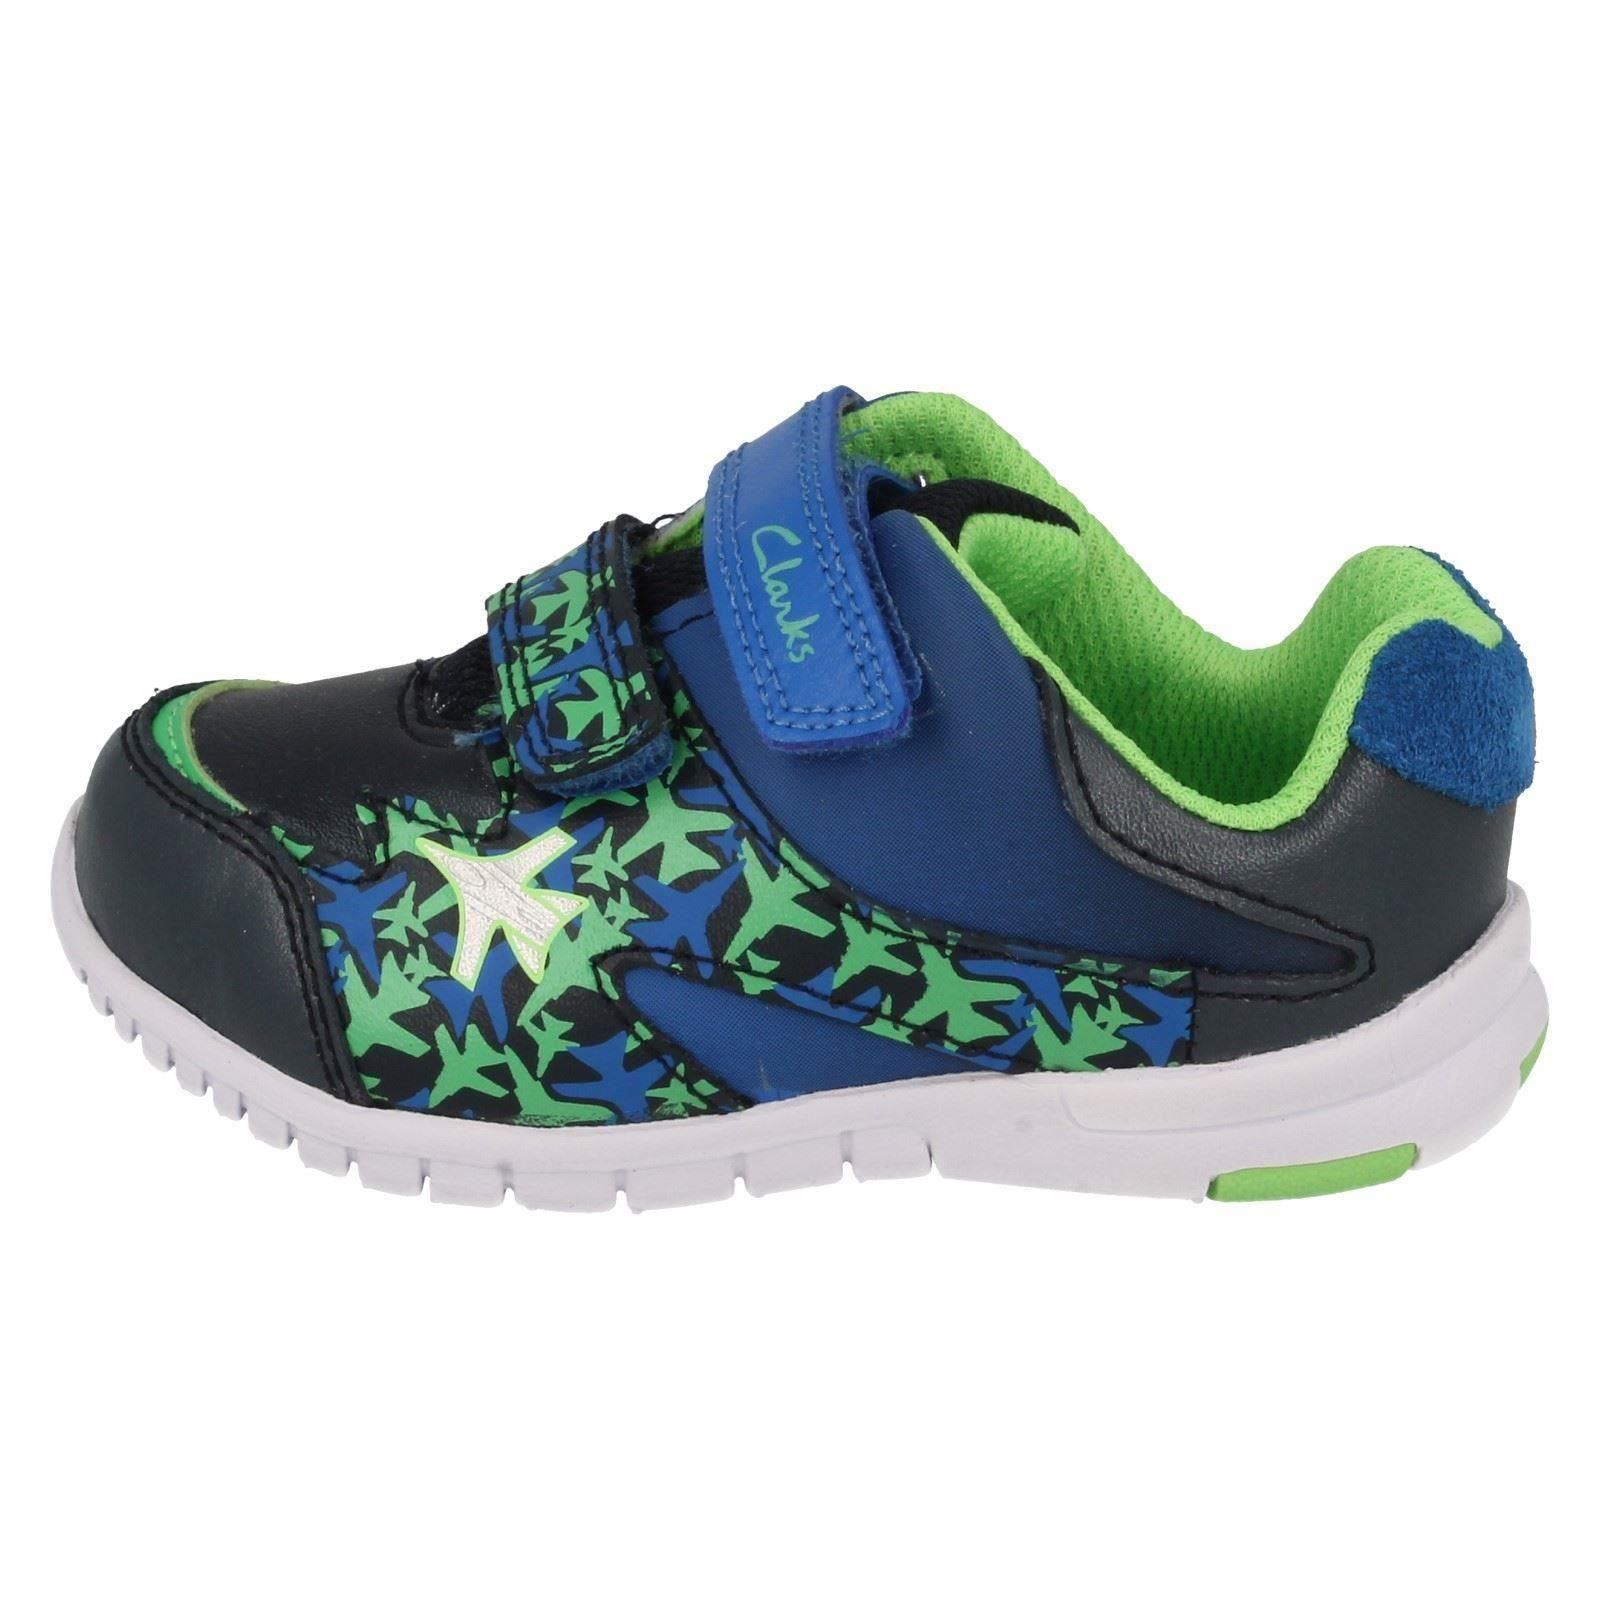 Azon Niños Zapatos Clarks Primeros Zoom ' TYzafq